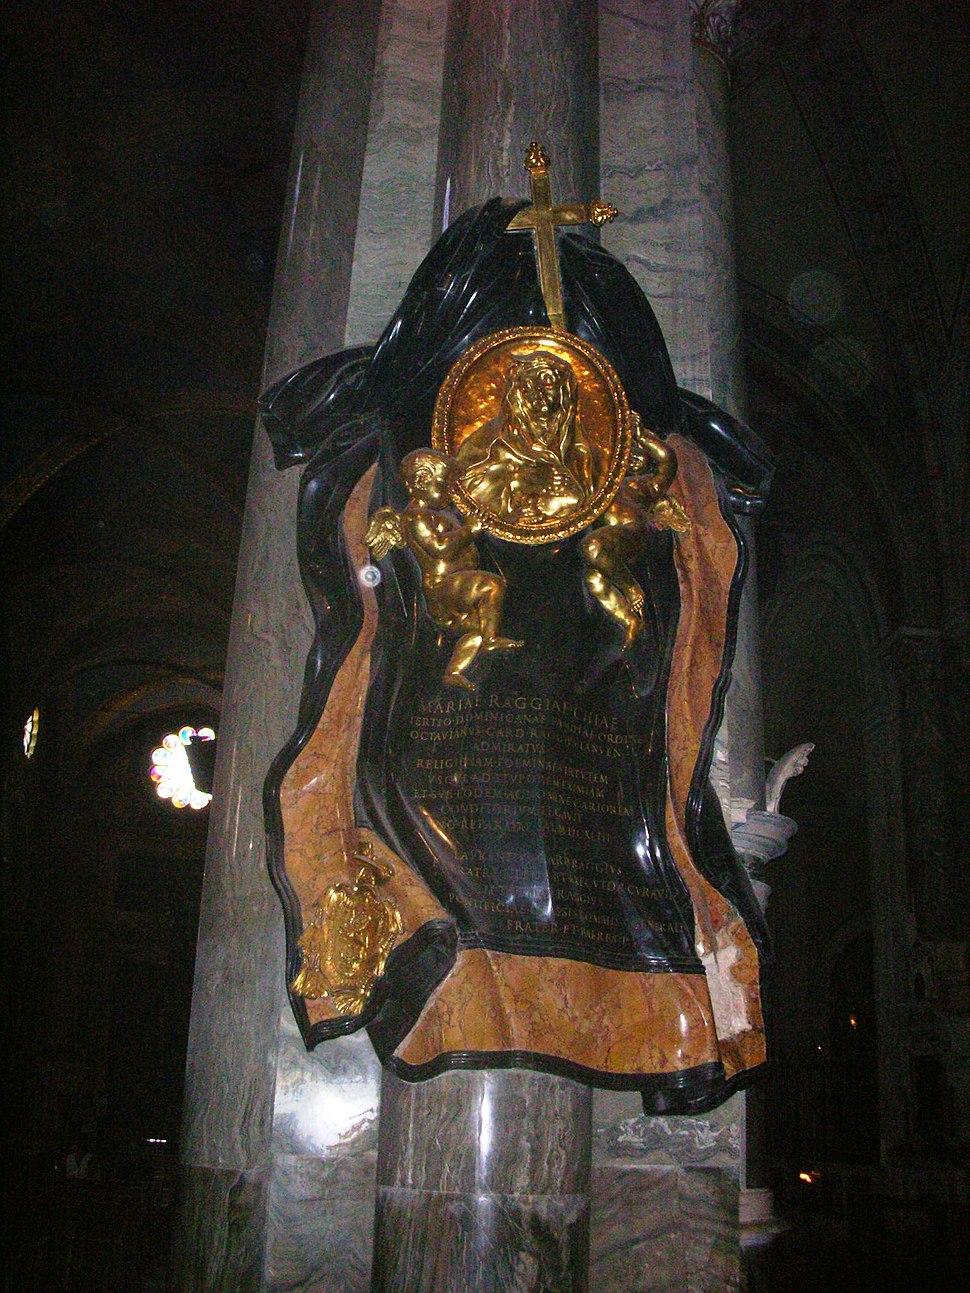 SantaMariaSopraMinerva-MonumentoFunebreBernini03-SteO153